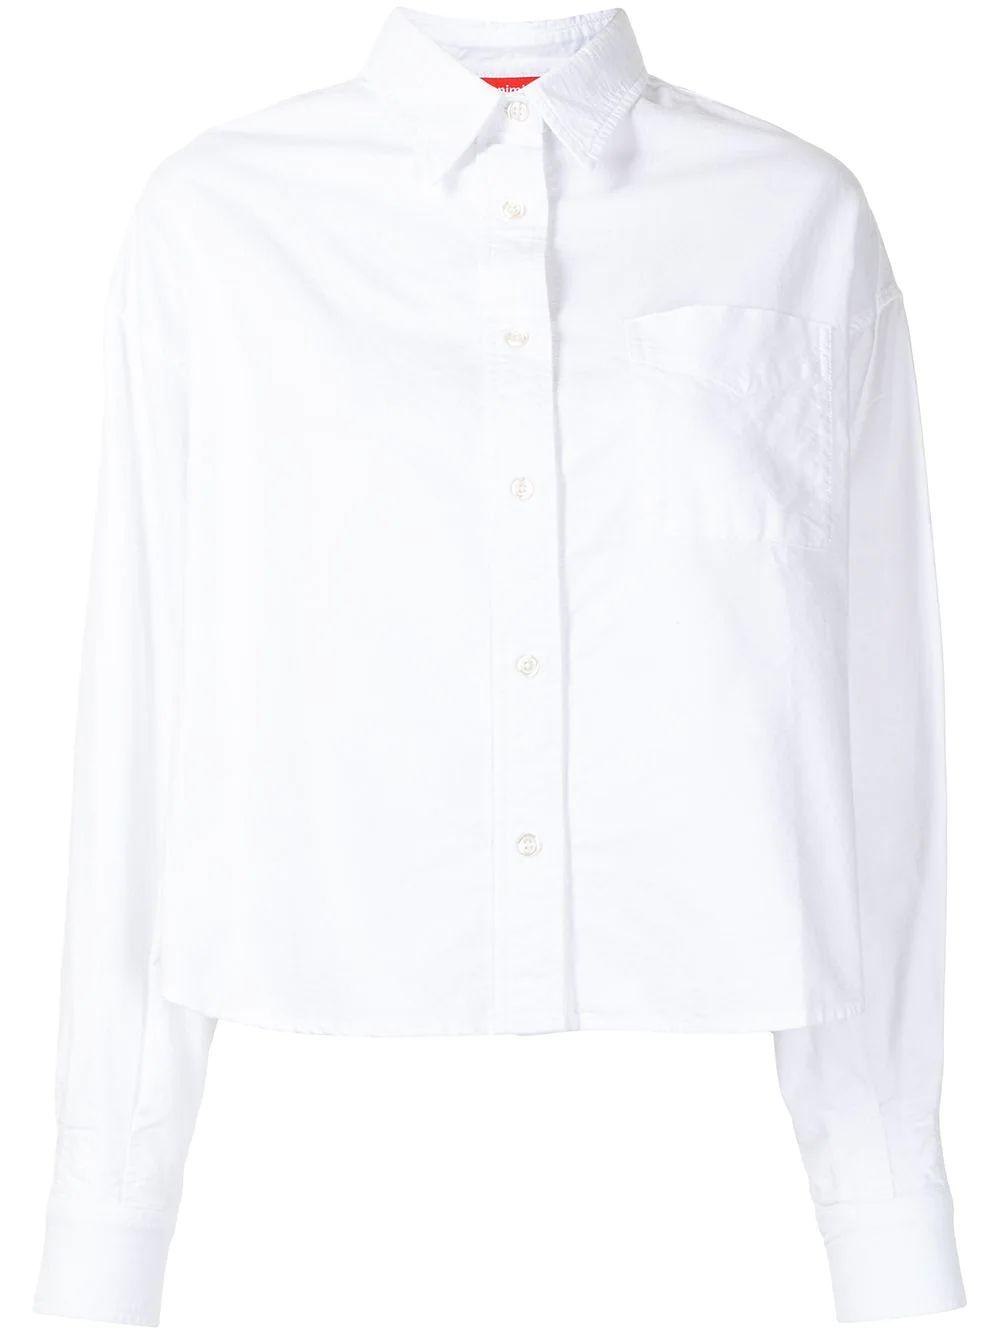 Mayfield Buttondown Shirt Item # DSW4240-850